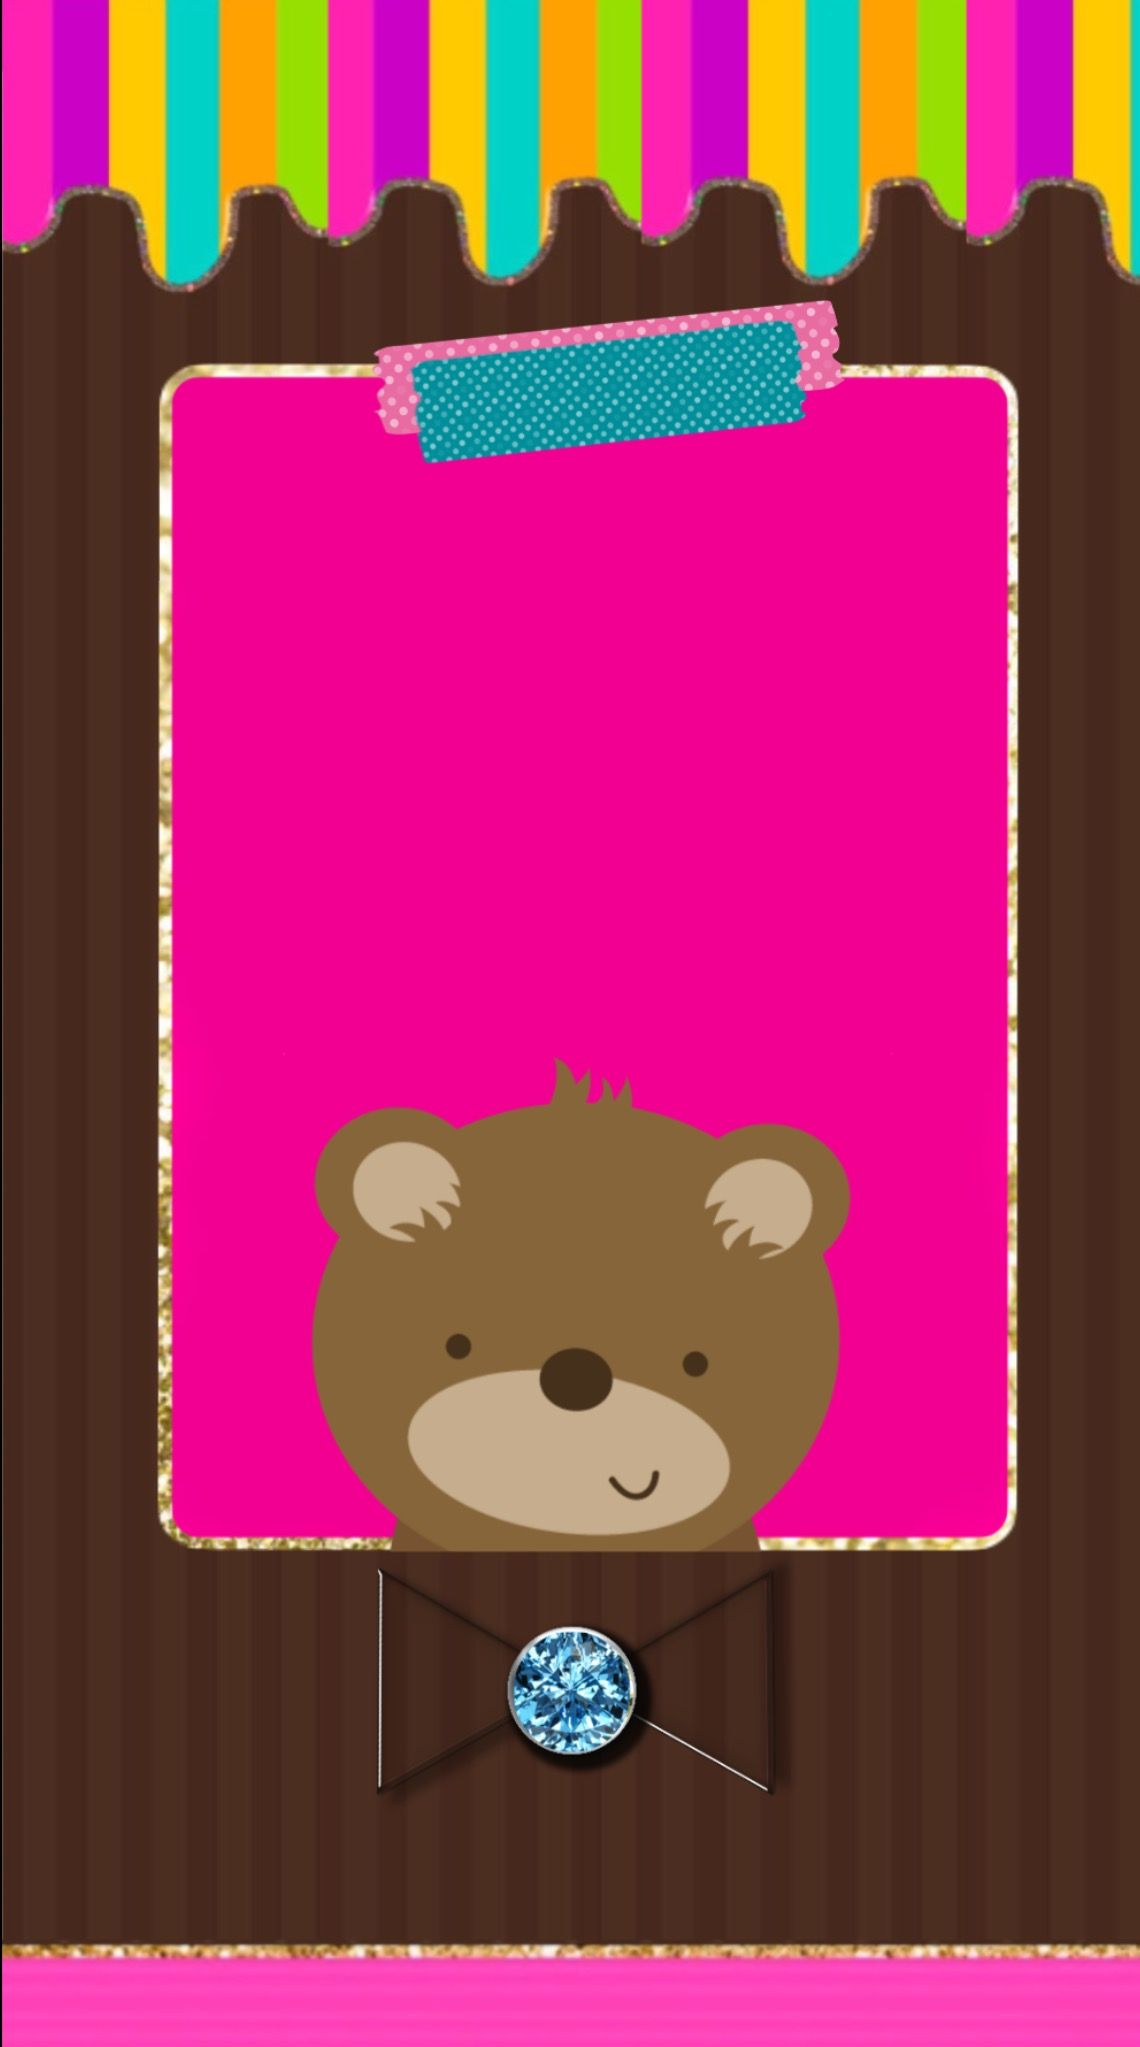 Download Wallpaper Hello Kitty Glitter - a0bbf9bd19f0a01b3da1a33fe1b05663  Photograph_561785.jpg